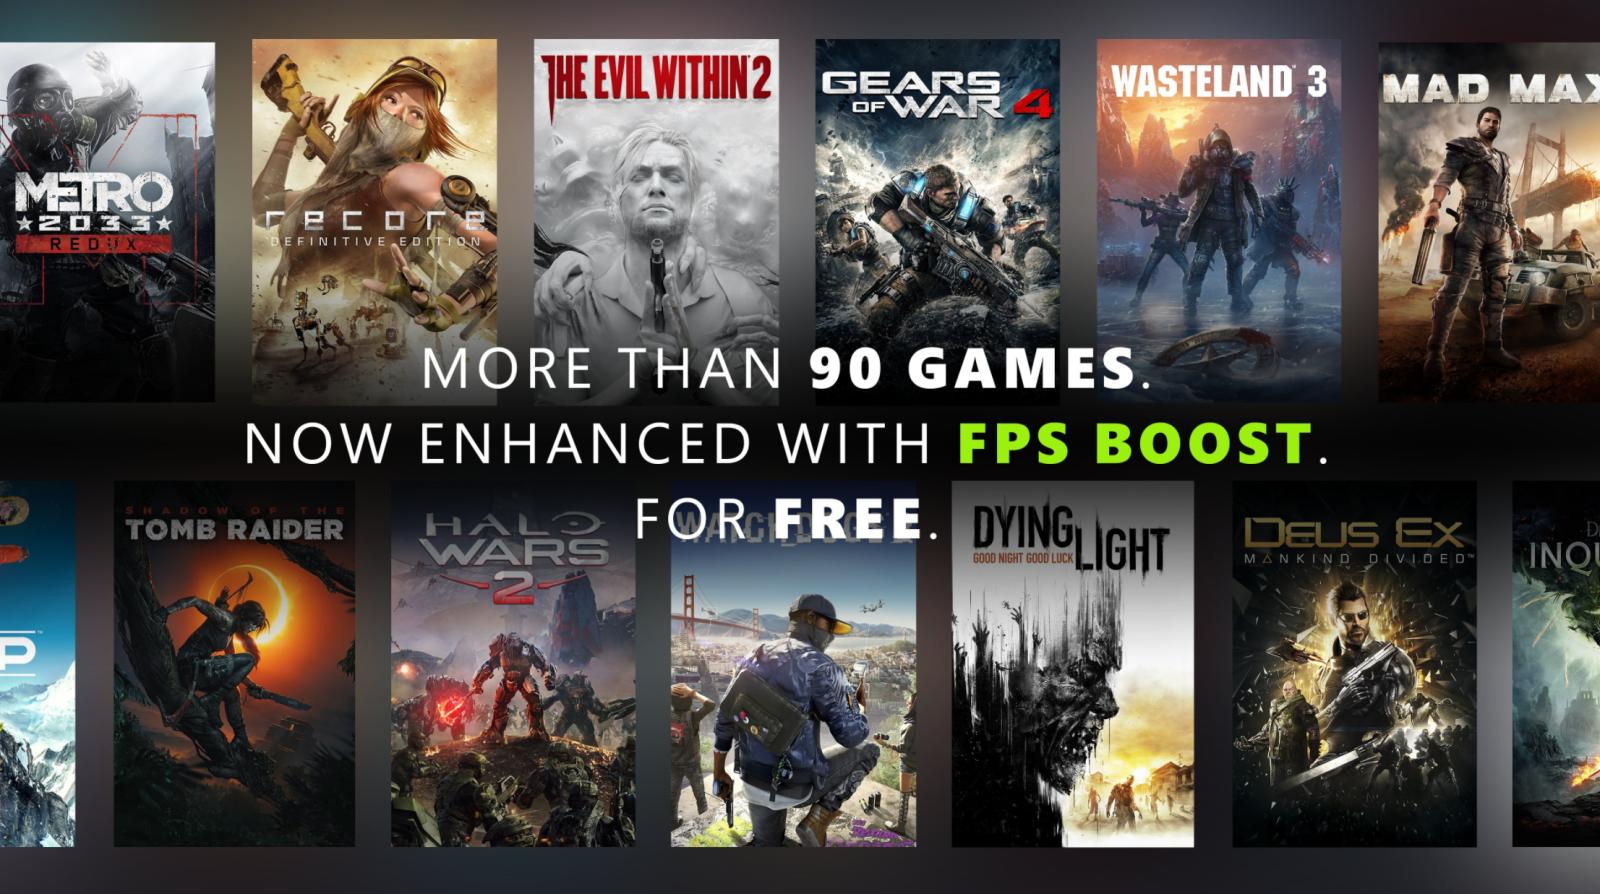 Xbox FPS Boost 游戏阵容大幅更新,现有97款游戏支持